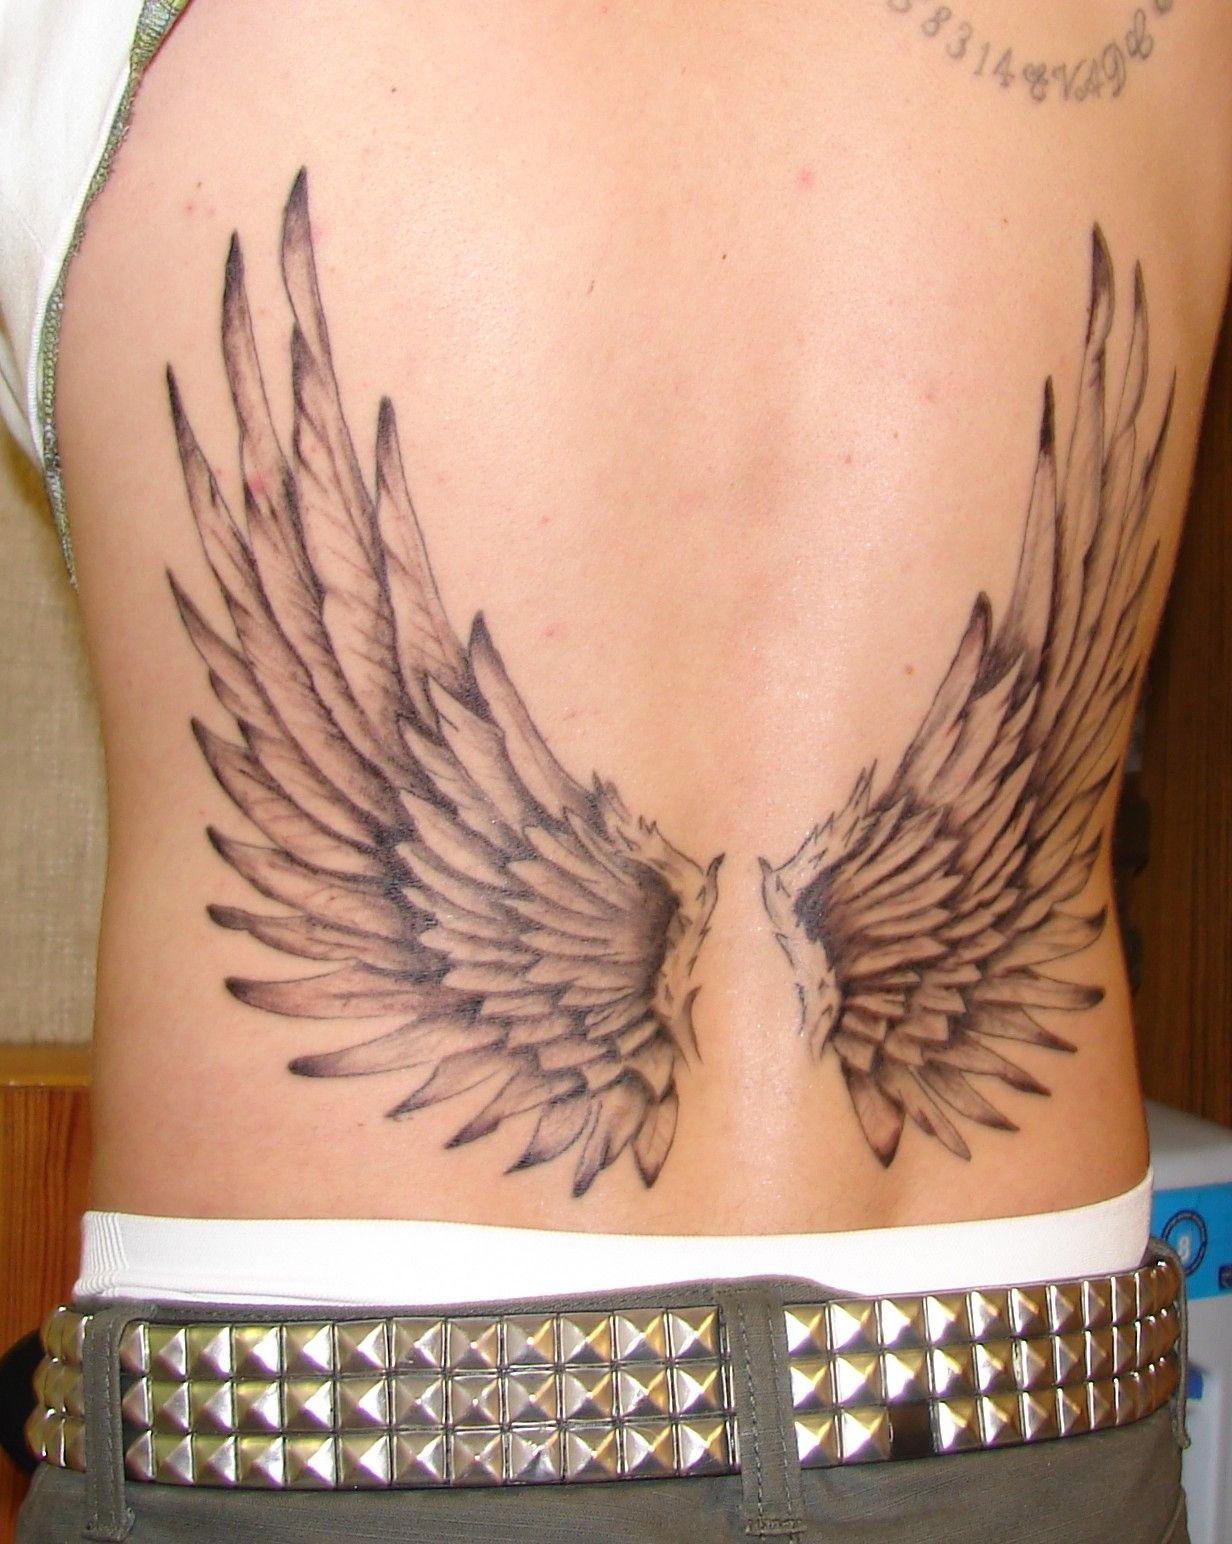 Lower back tattoo ideas for men angel wing tattoos  angel wings tattoo on lower back  email off